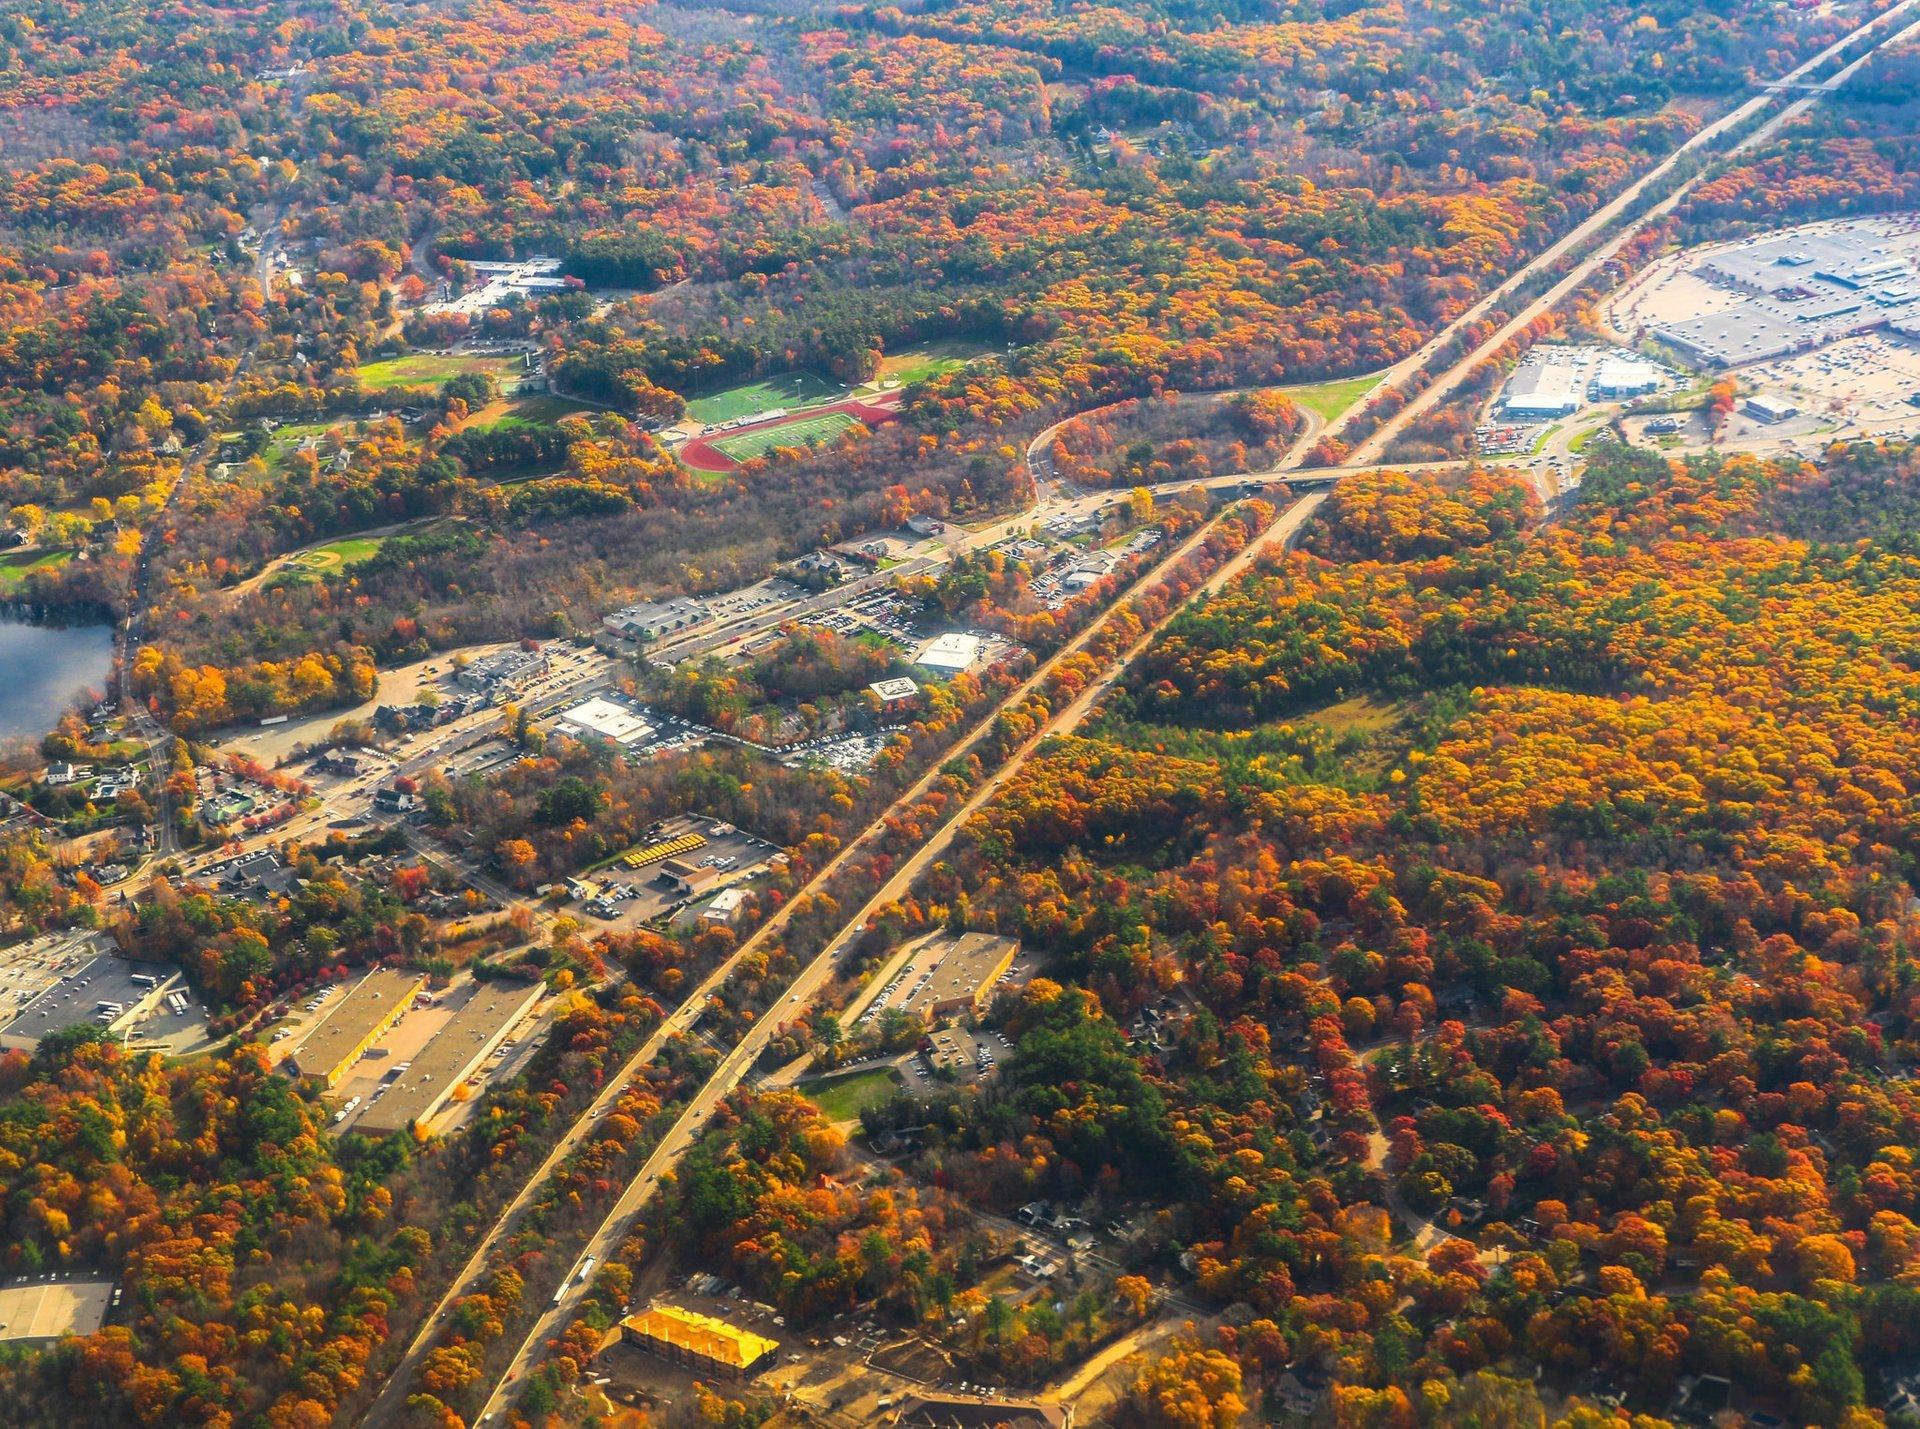 Fall foliage outside Boston 2020